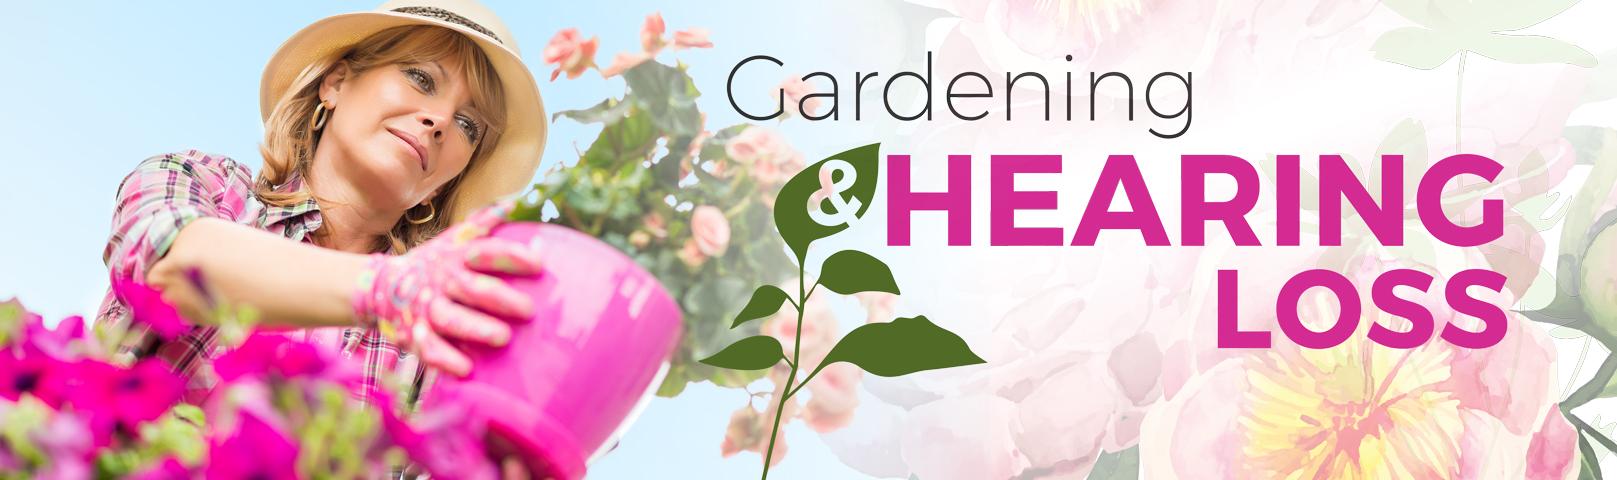 Gardening and hearing loss